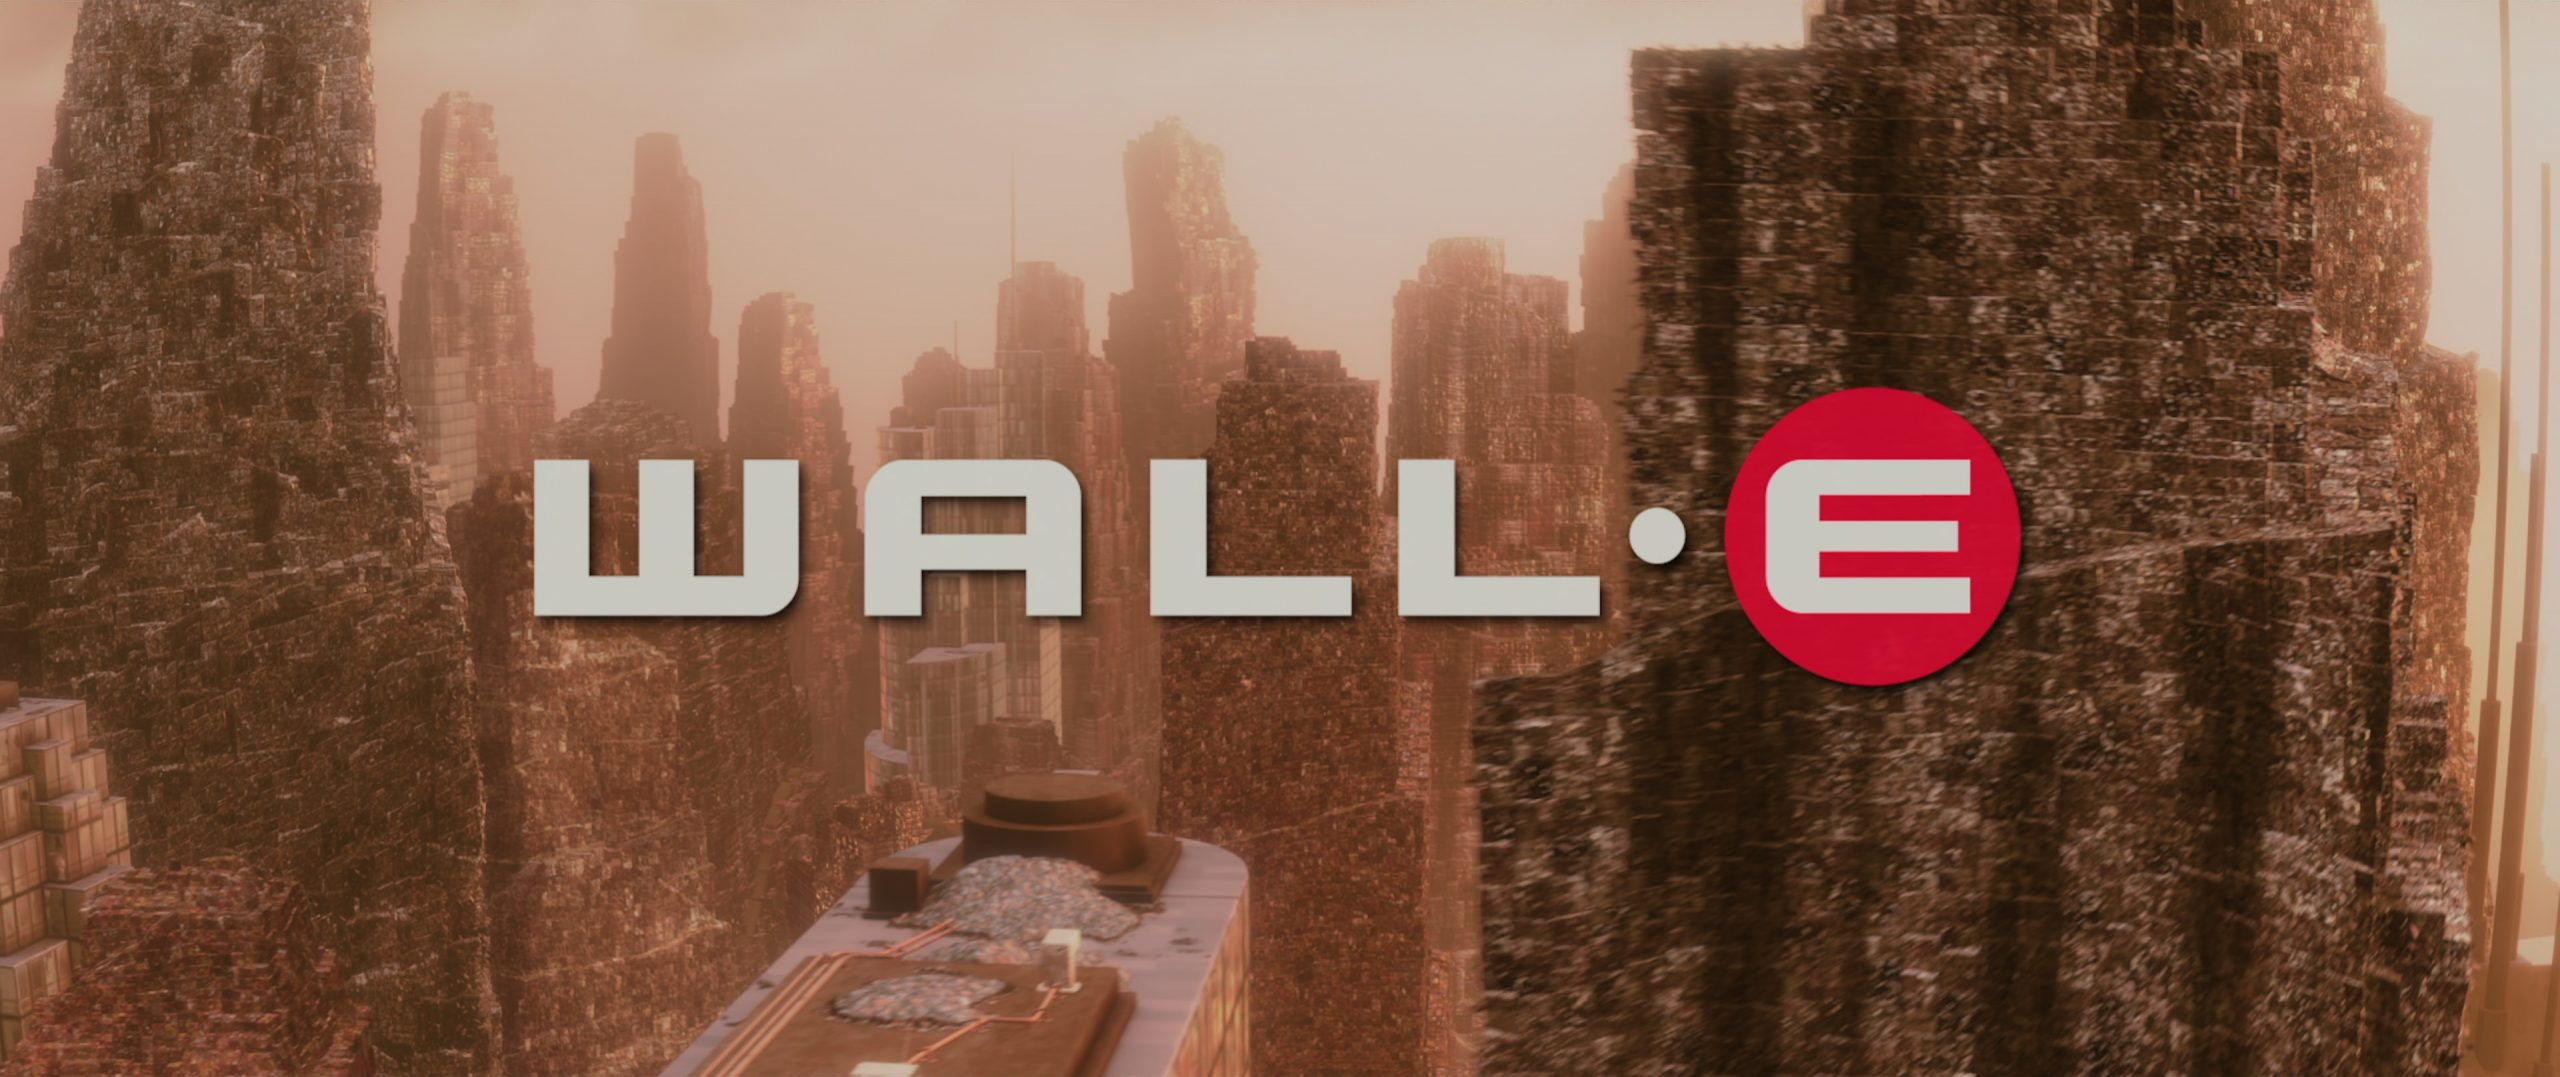 WALL·E (2008) [4K]